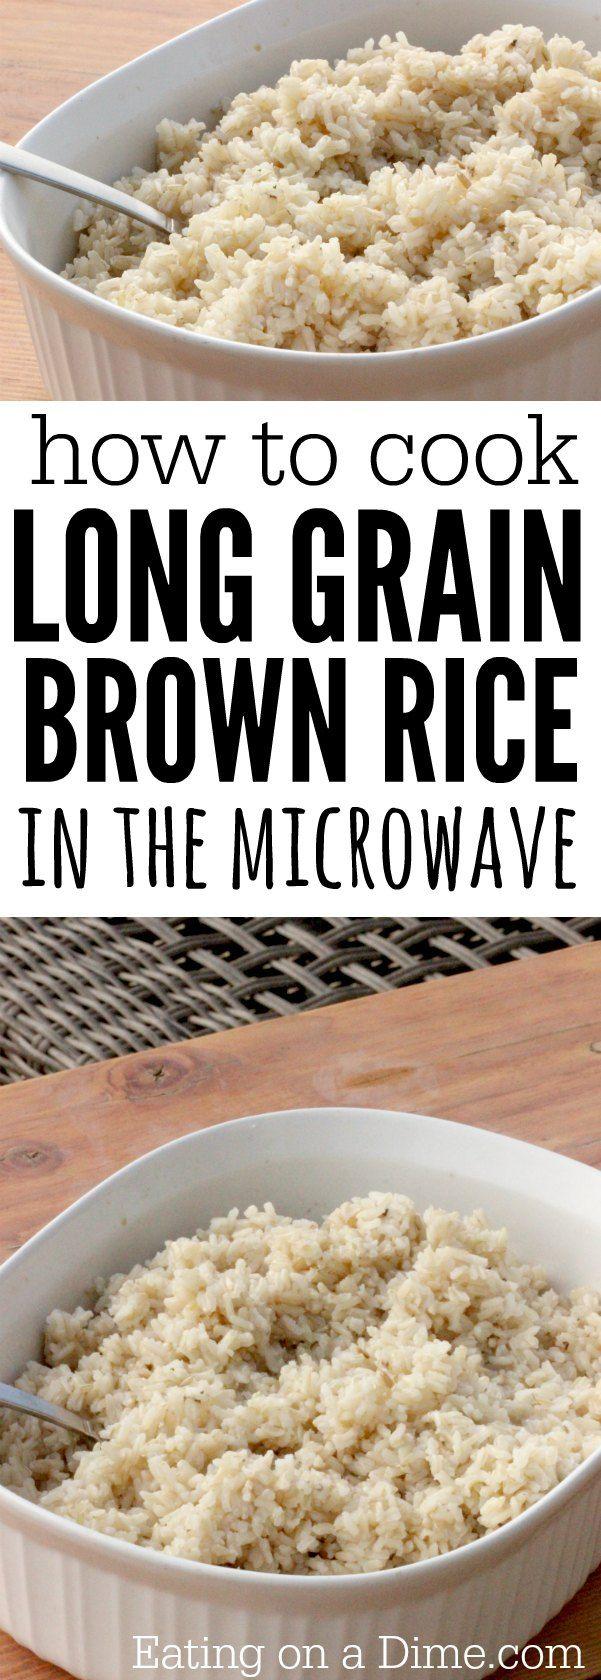 How To Microwave Long Grain Rice